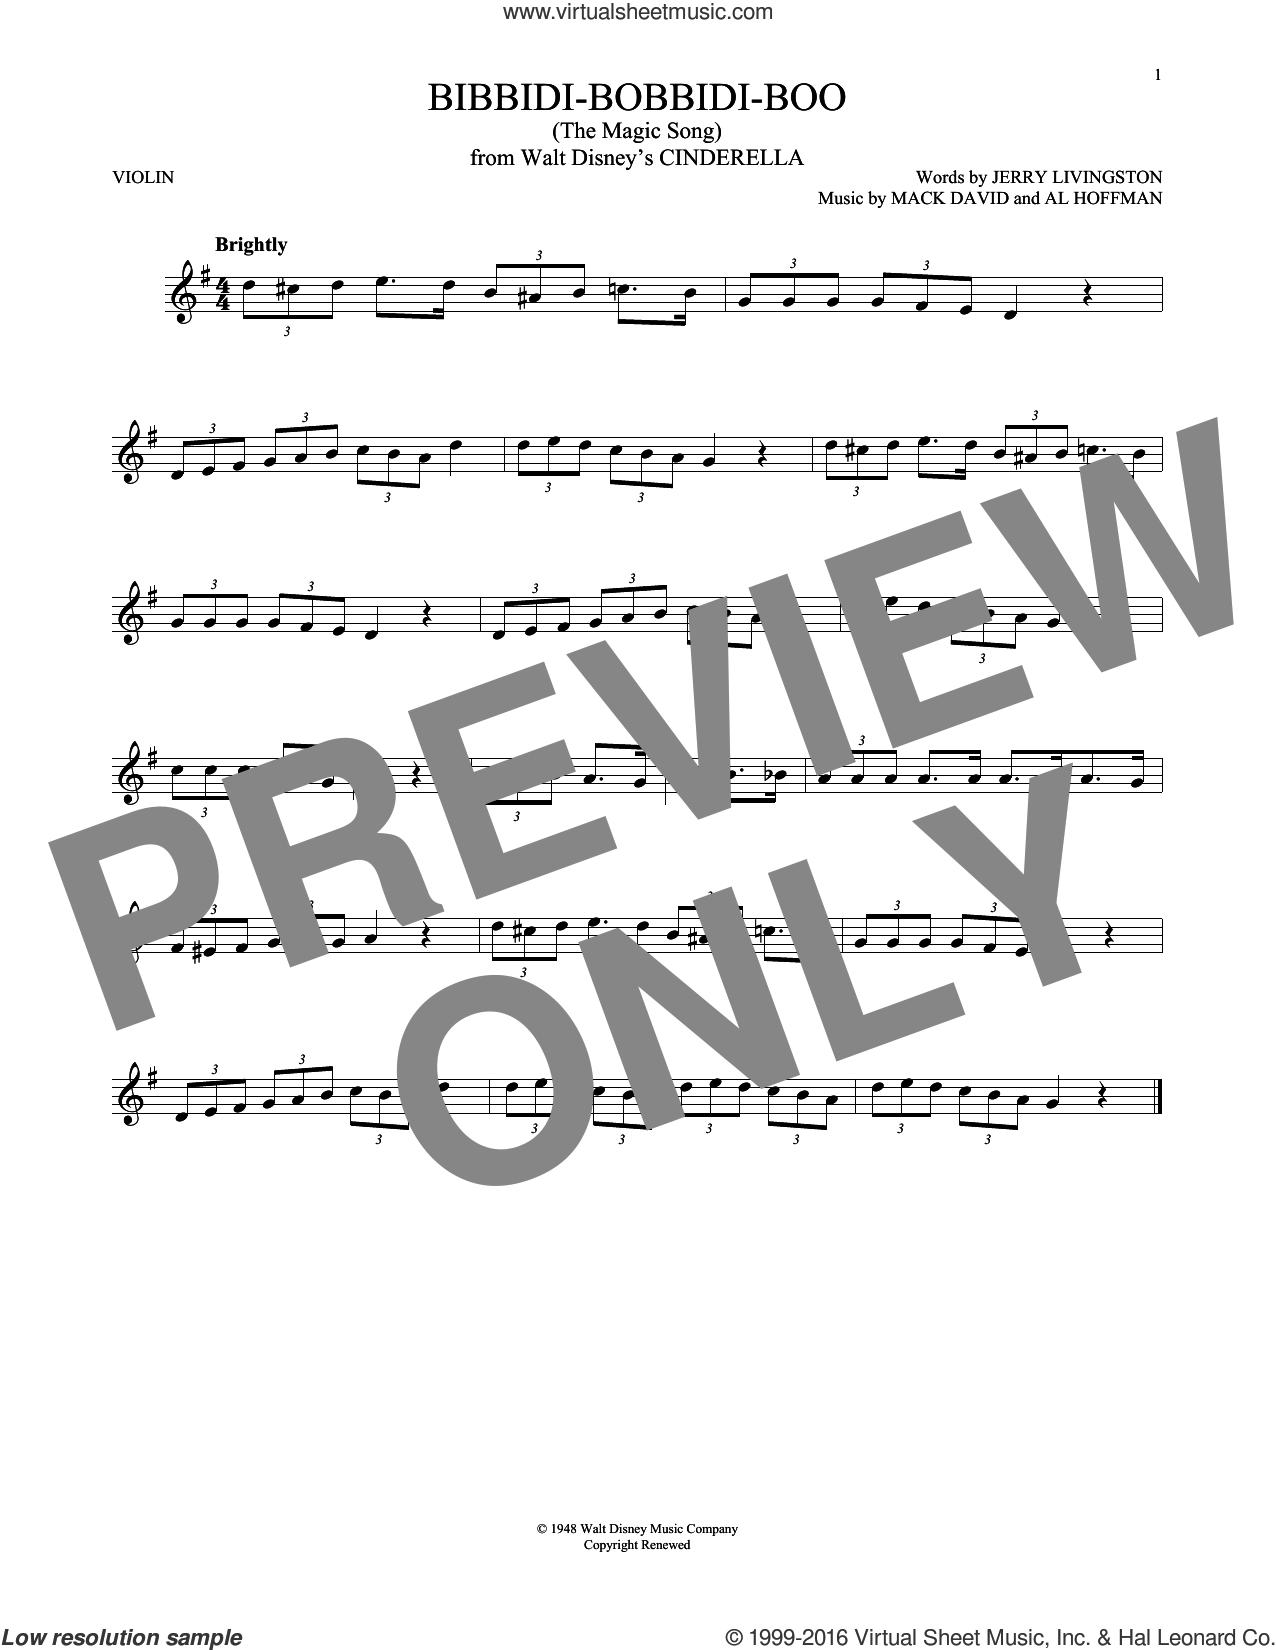 Bibbidi-Bobbidi-Boo (The Magic Song) (from Disney's Cinderella) sheet music for violin solo by Jerry Livingston, Al Hoffman and Mack David, intermediate skill level